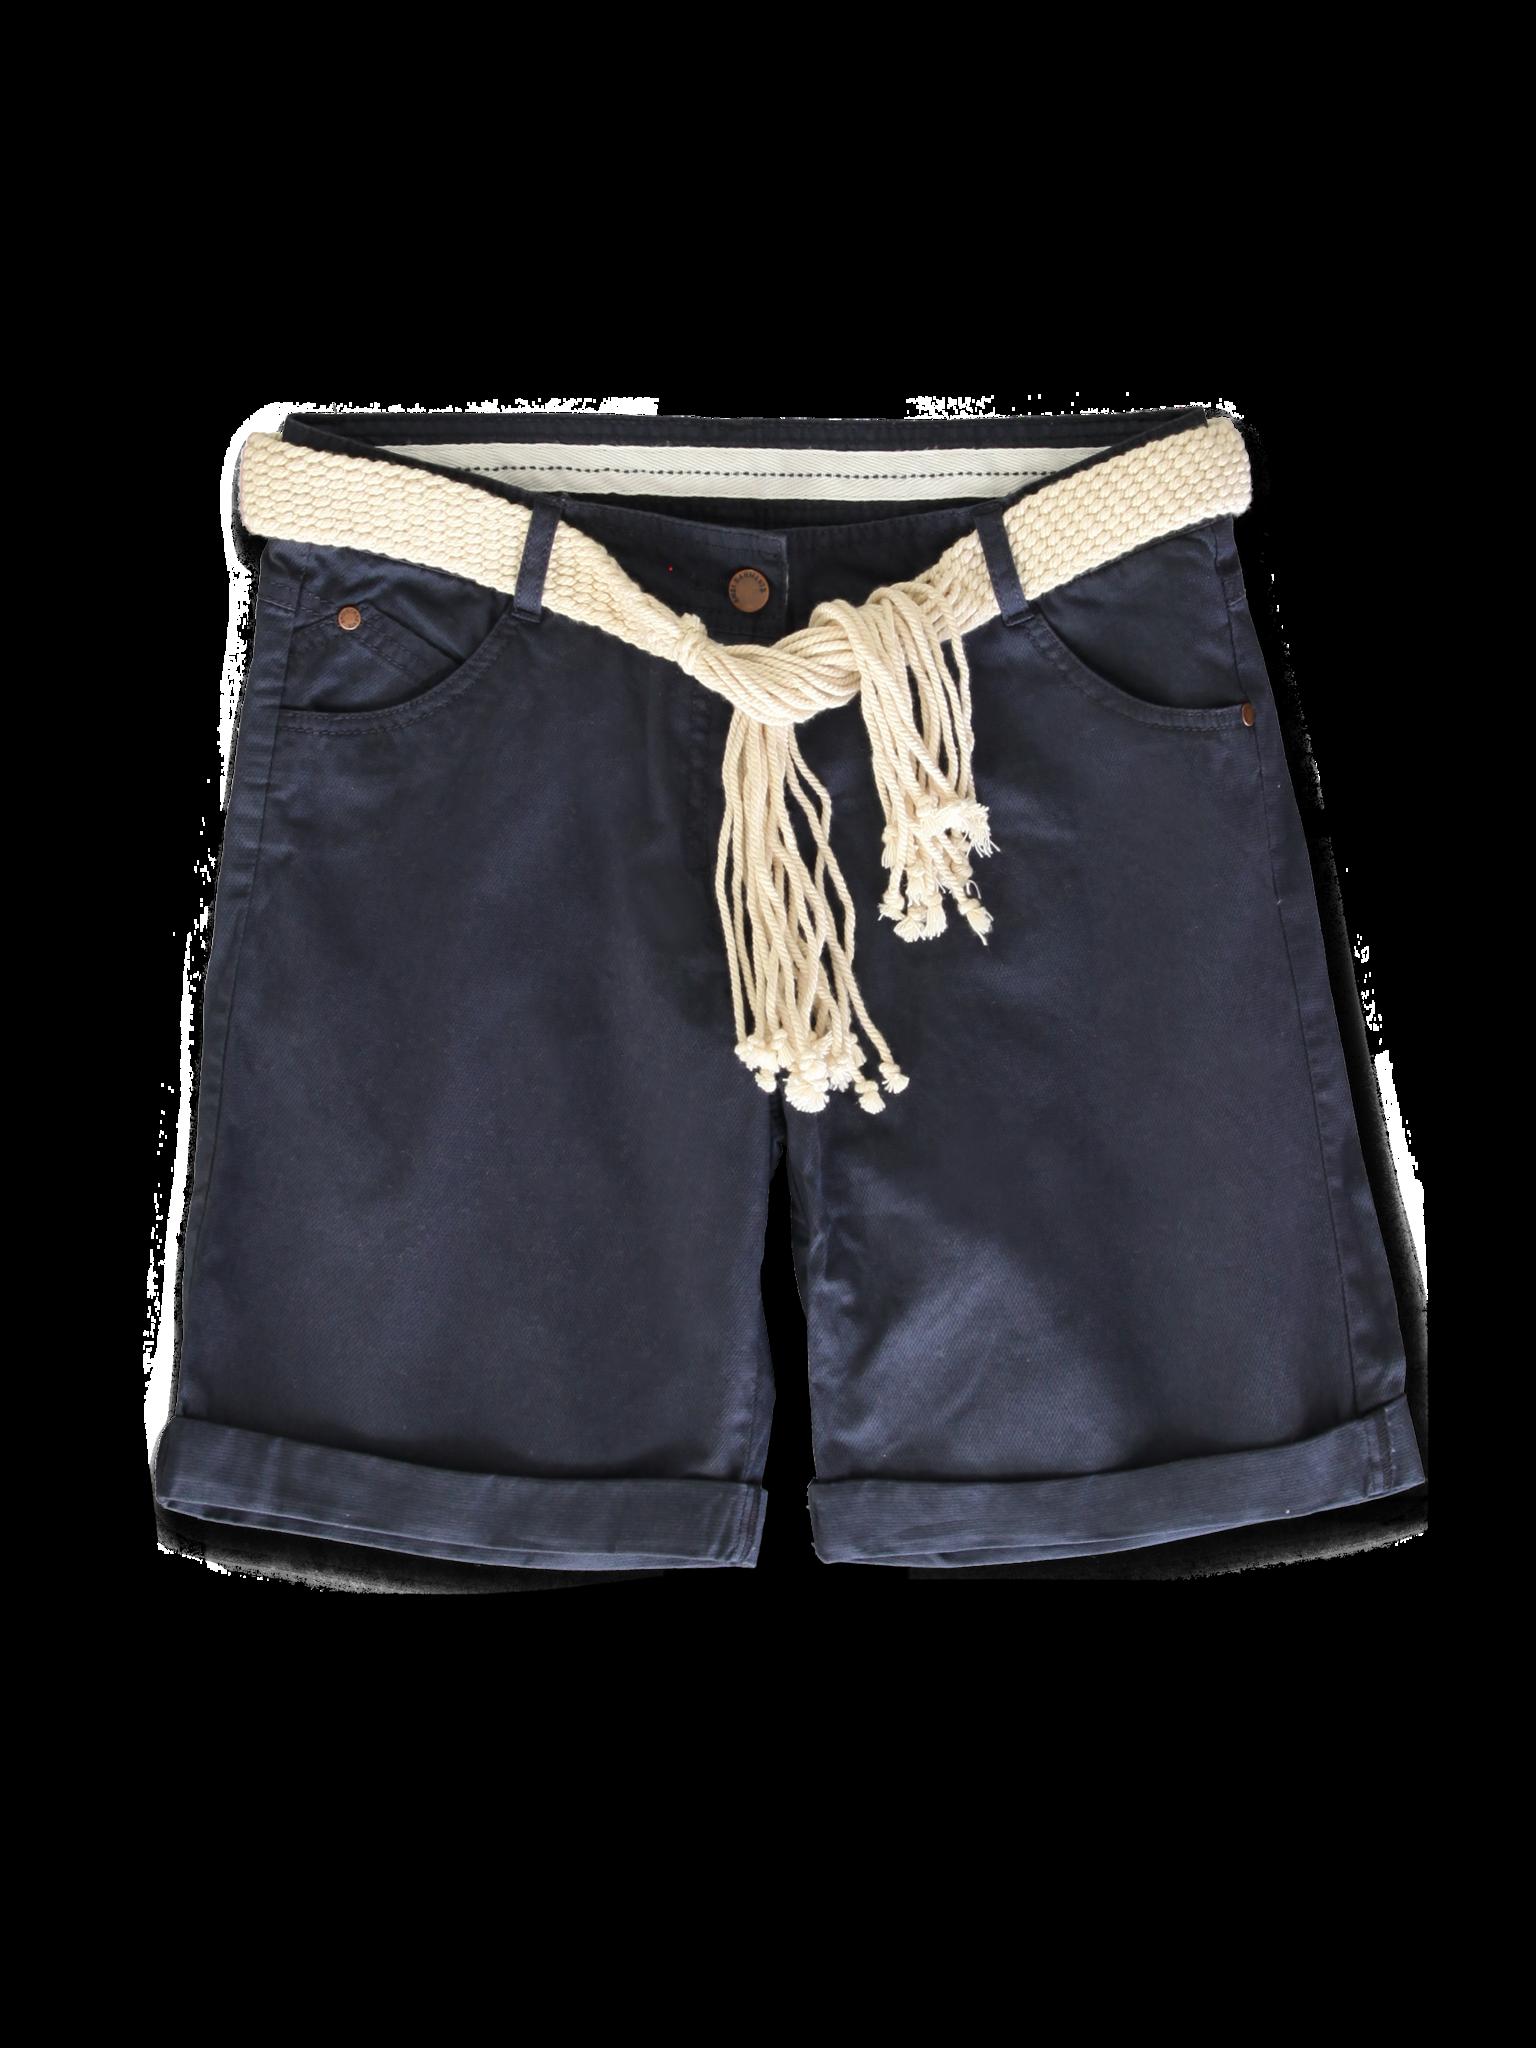 All Brands | Summerproducts Ladies | Bermuda | 24 pcs/box